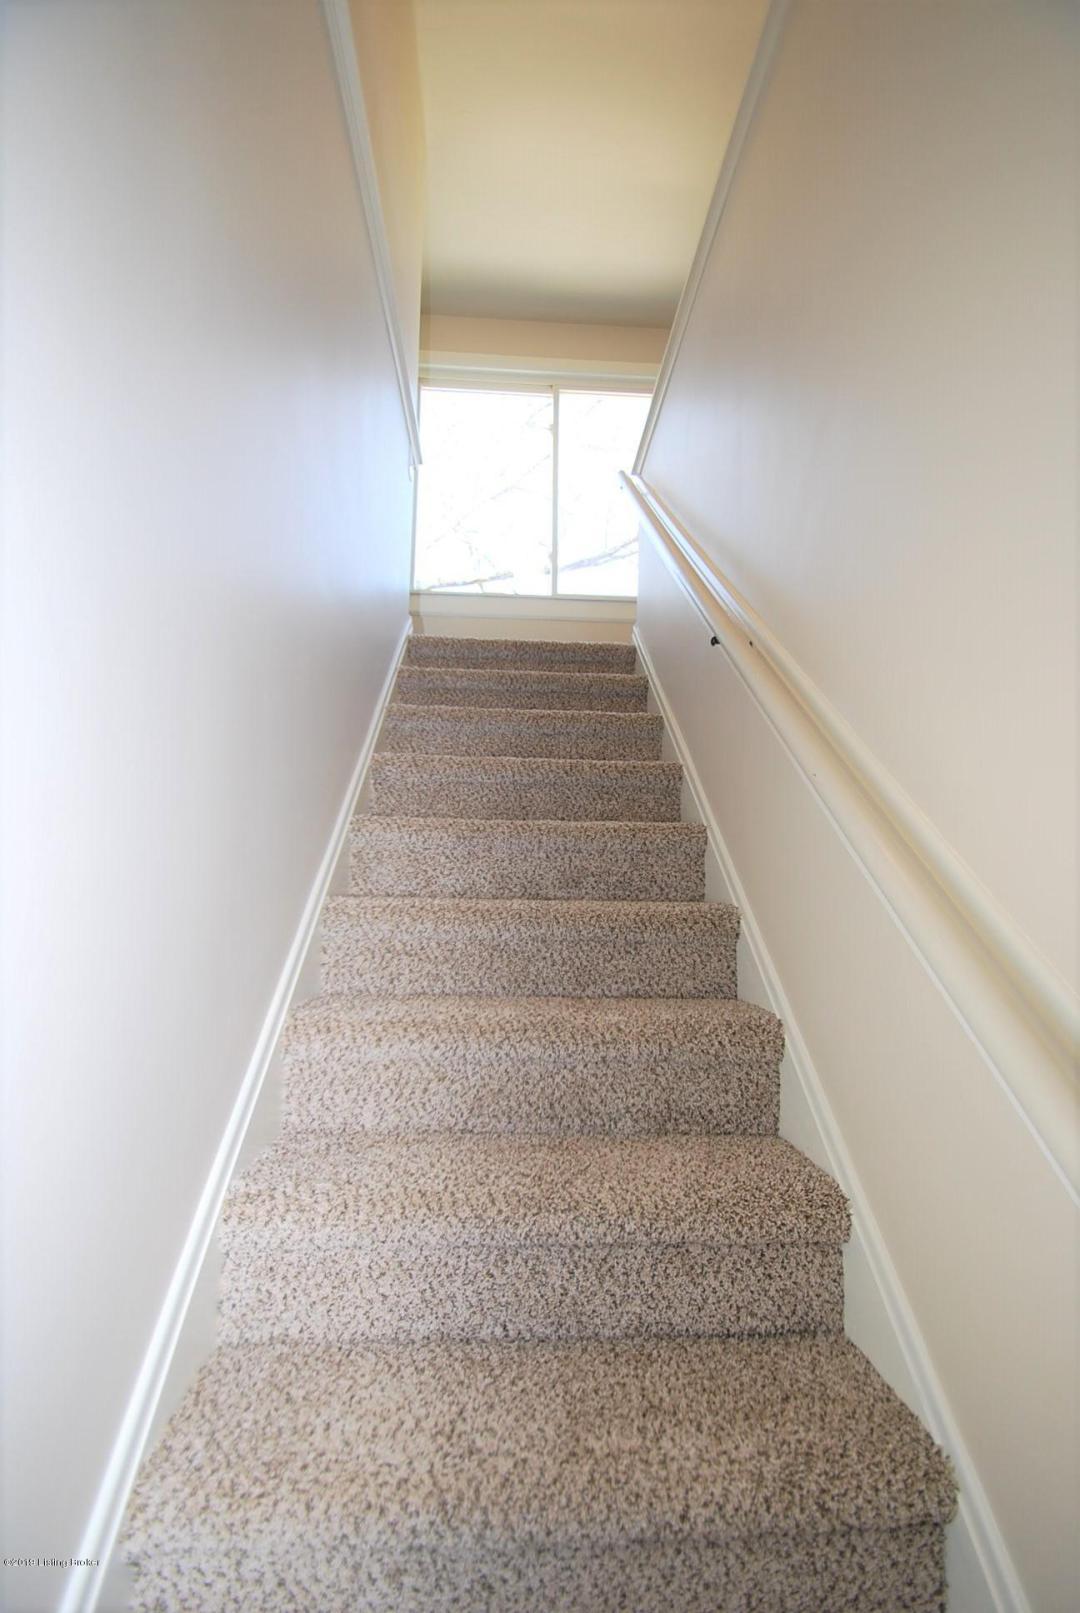 2804 Sharon Way, Louisville, Kentucky 40220, 3 Bedrooms Bedrooms, 6 Rooms Rooms,2 BathroomsBathrooms,Residential,For Sale,Sharon,1527931